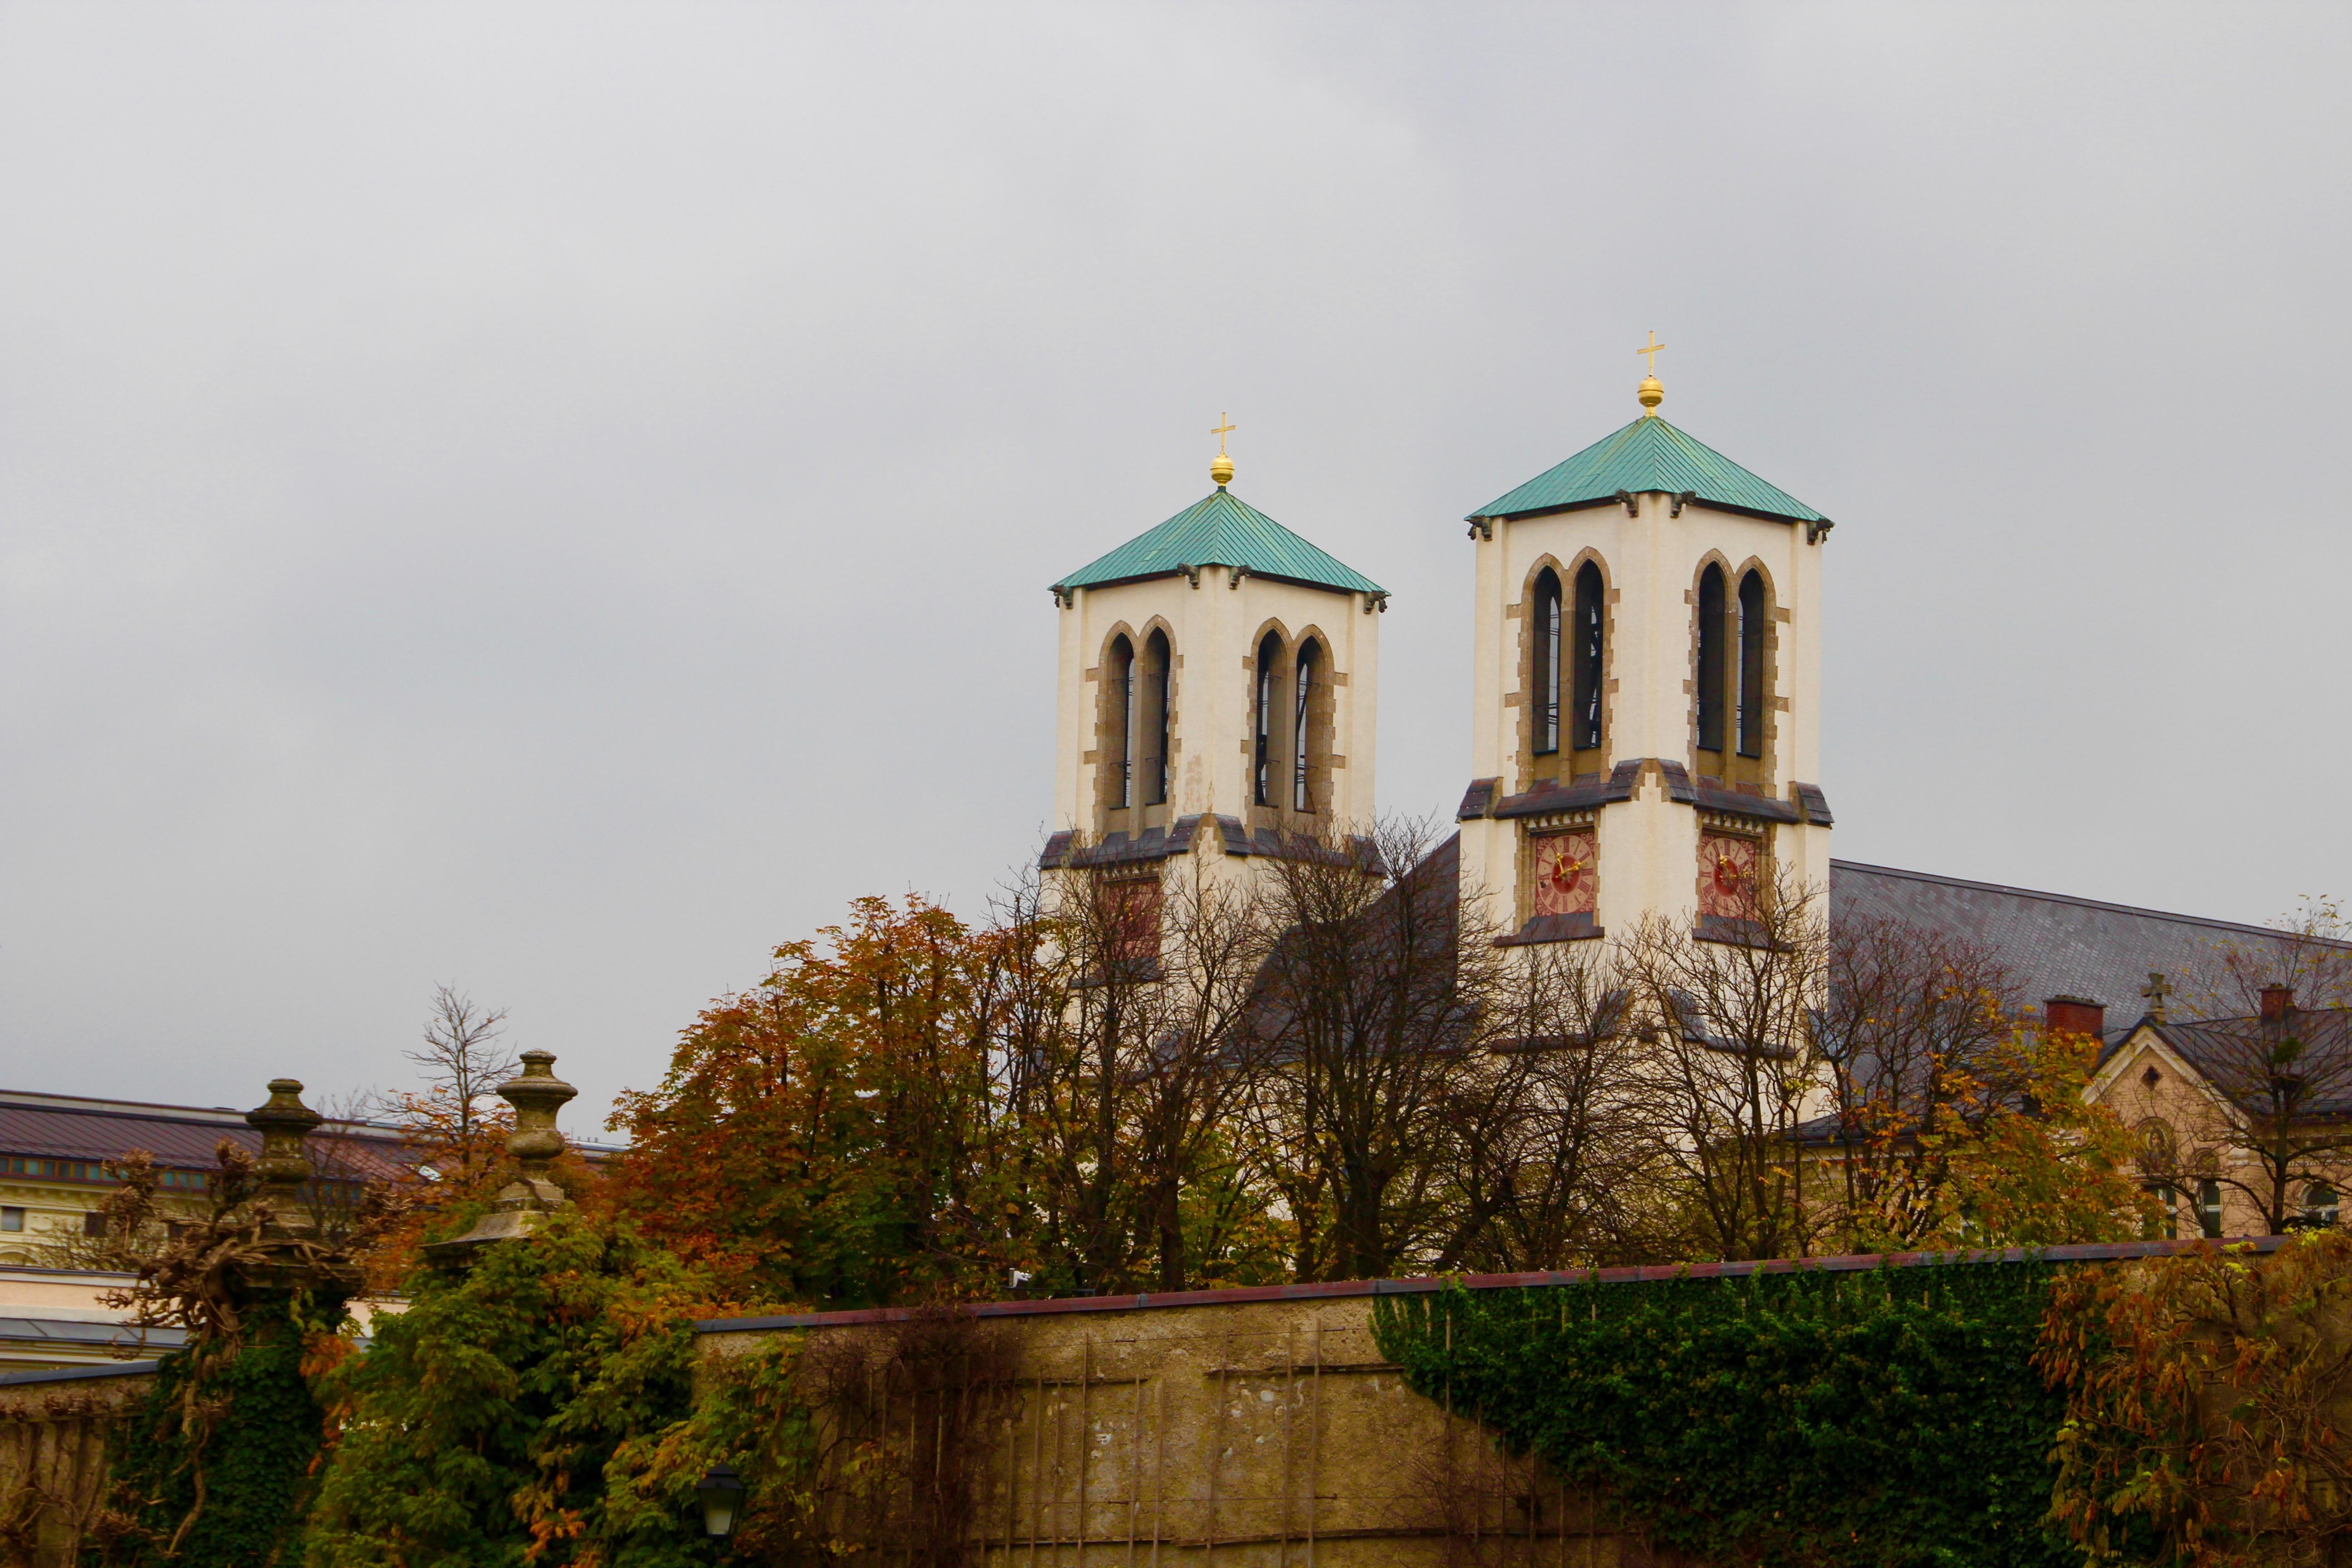 Abbey in Salzburg